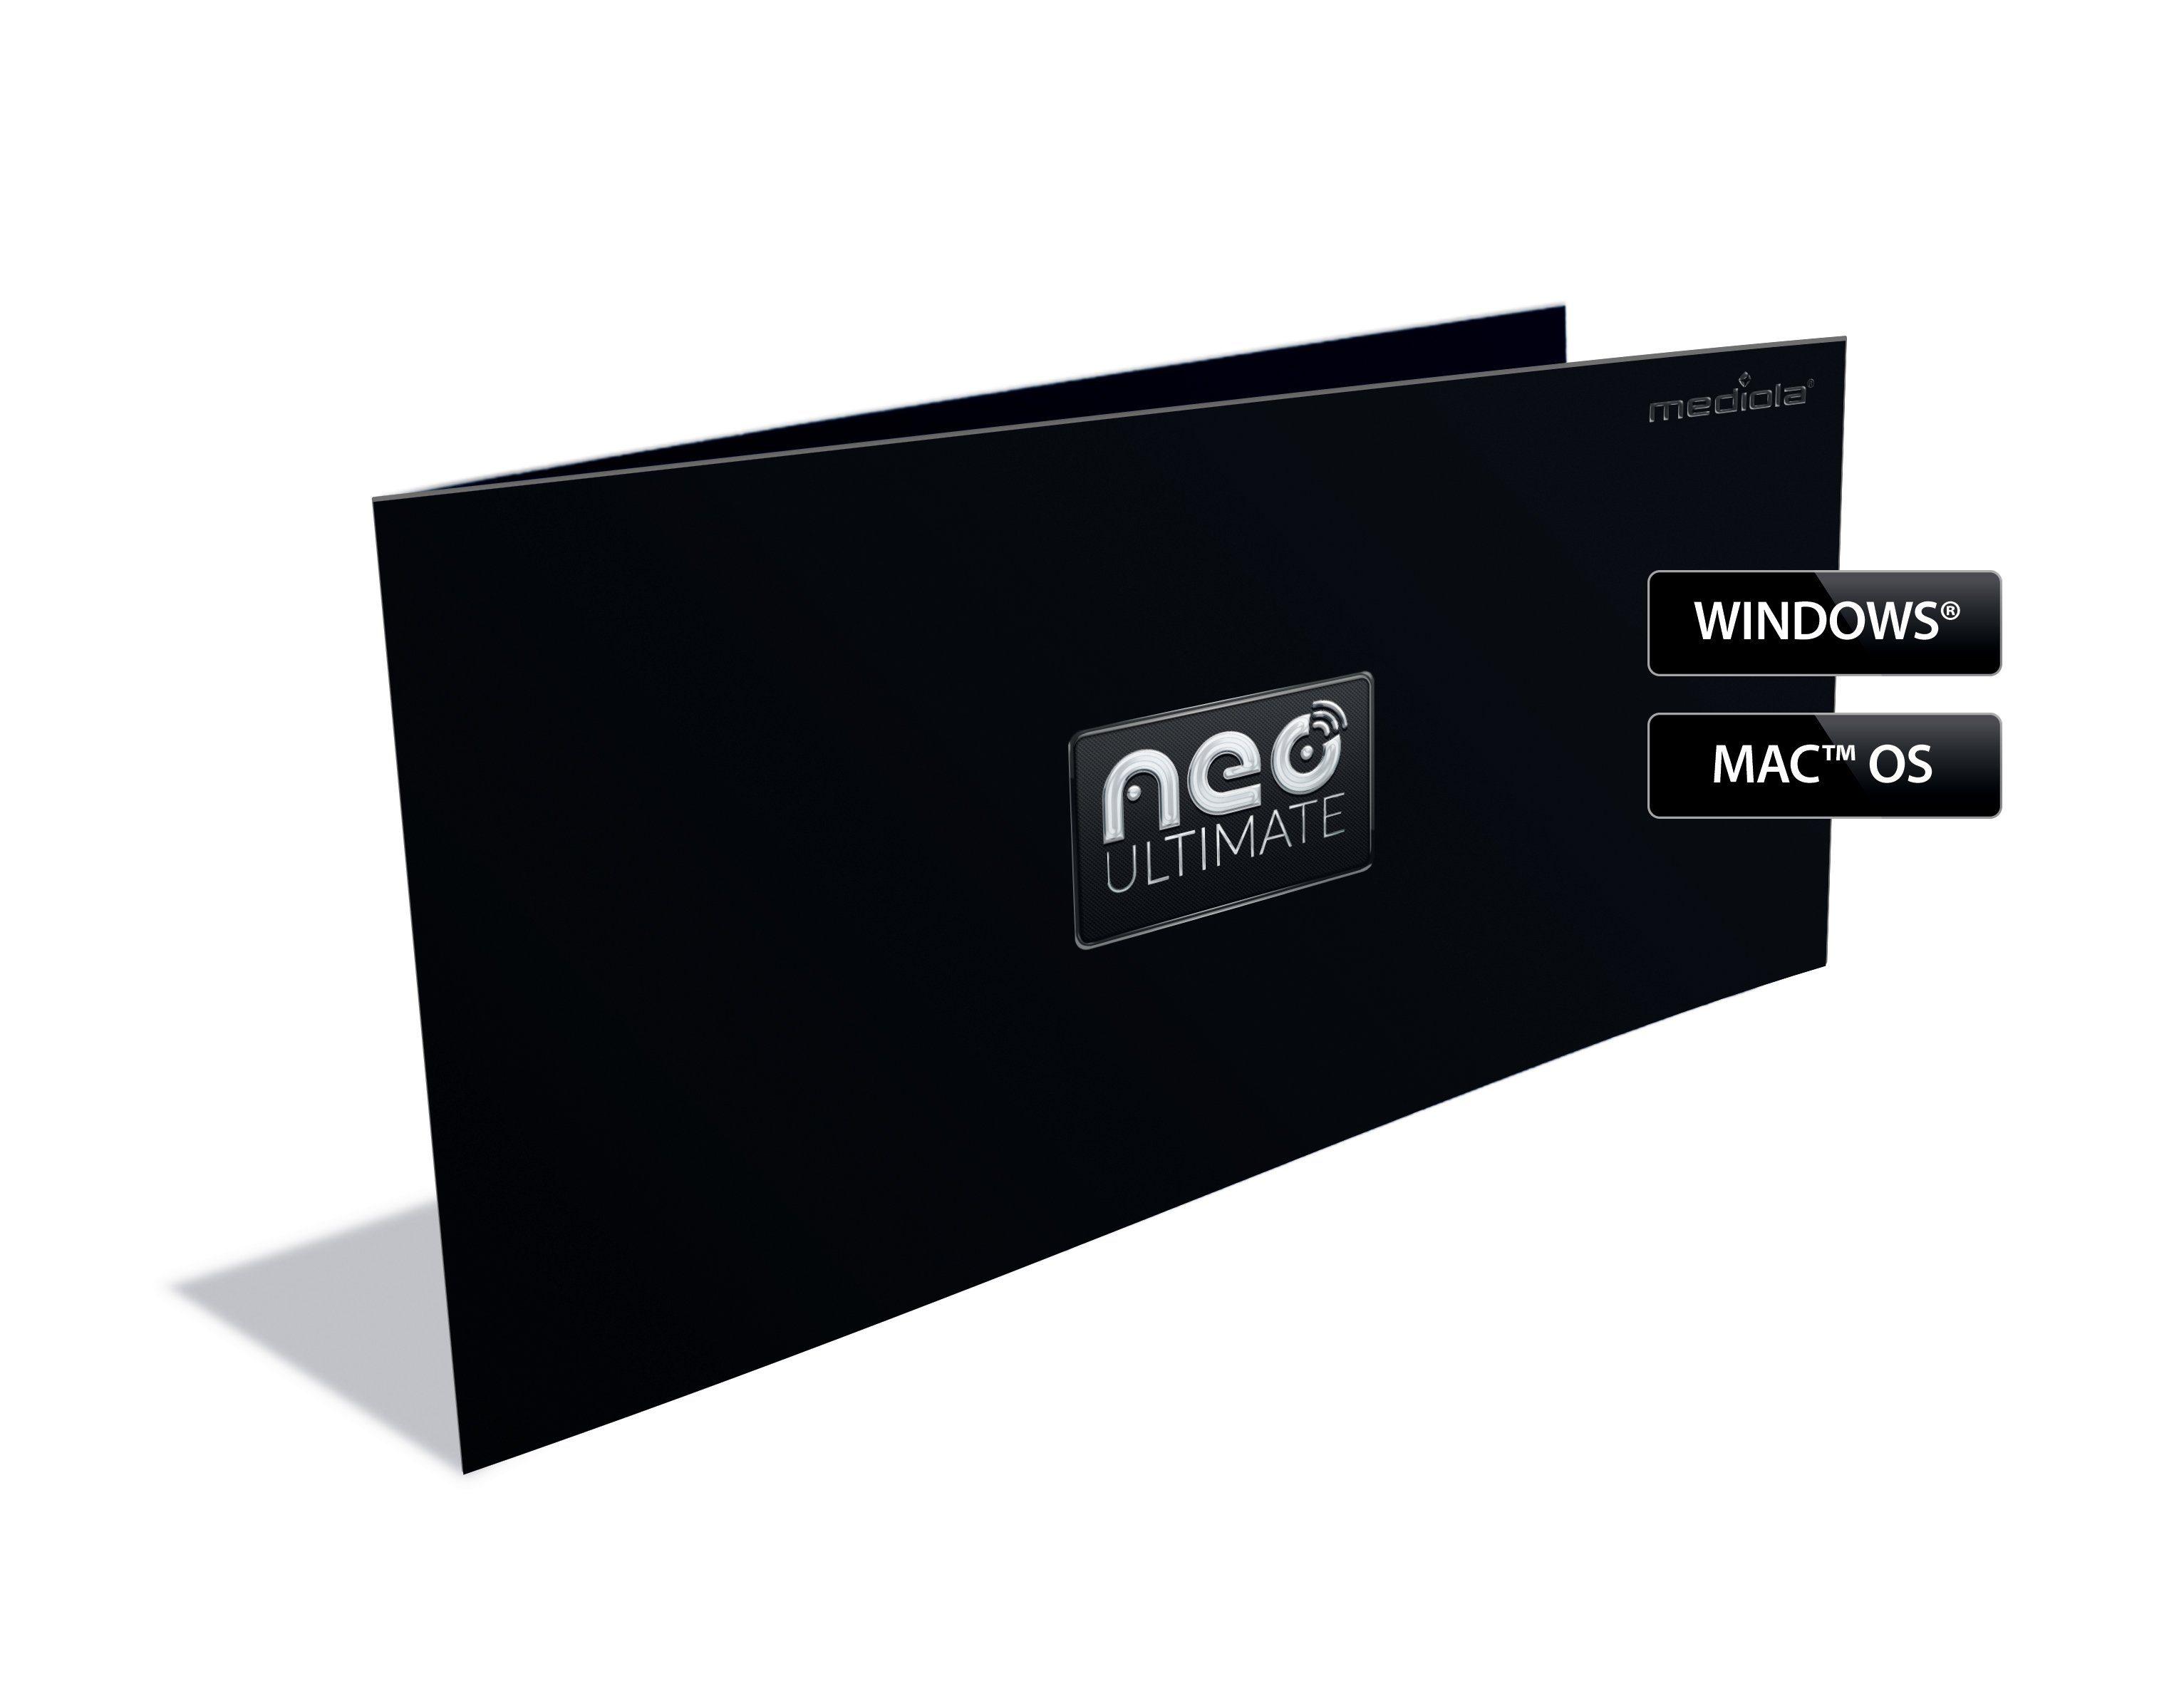 Mediola Smart Home - Steuerung & Komfort »AIO CREATOR NEO ULTIMATE - SFW-5000«